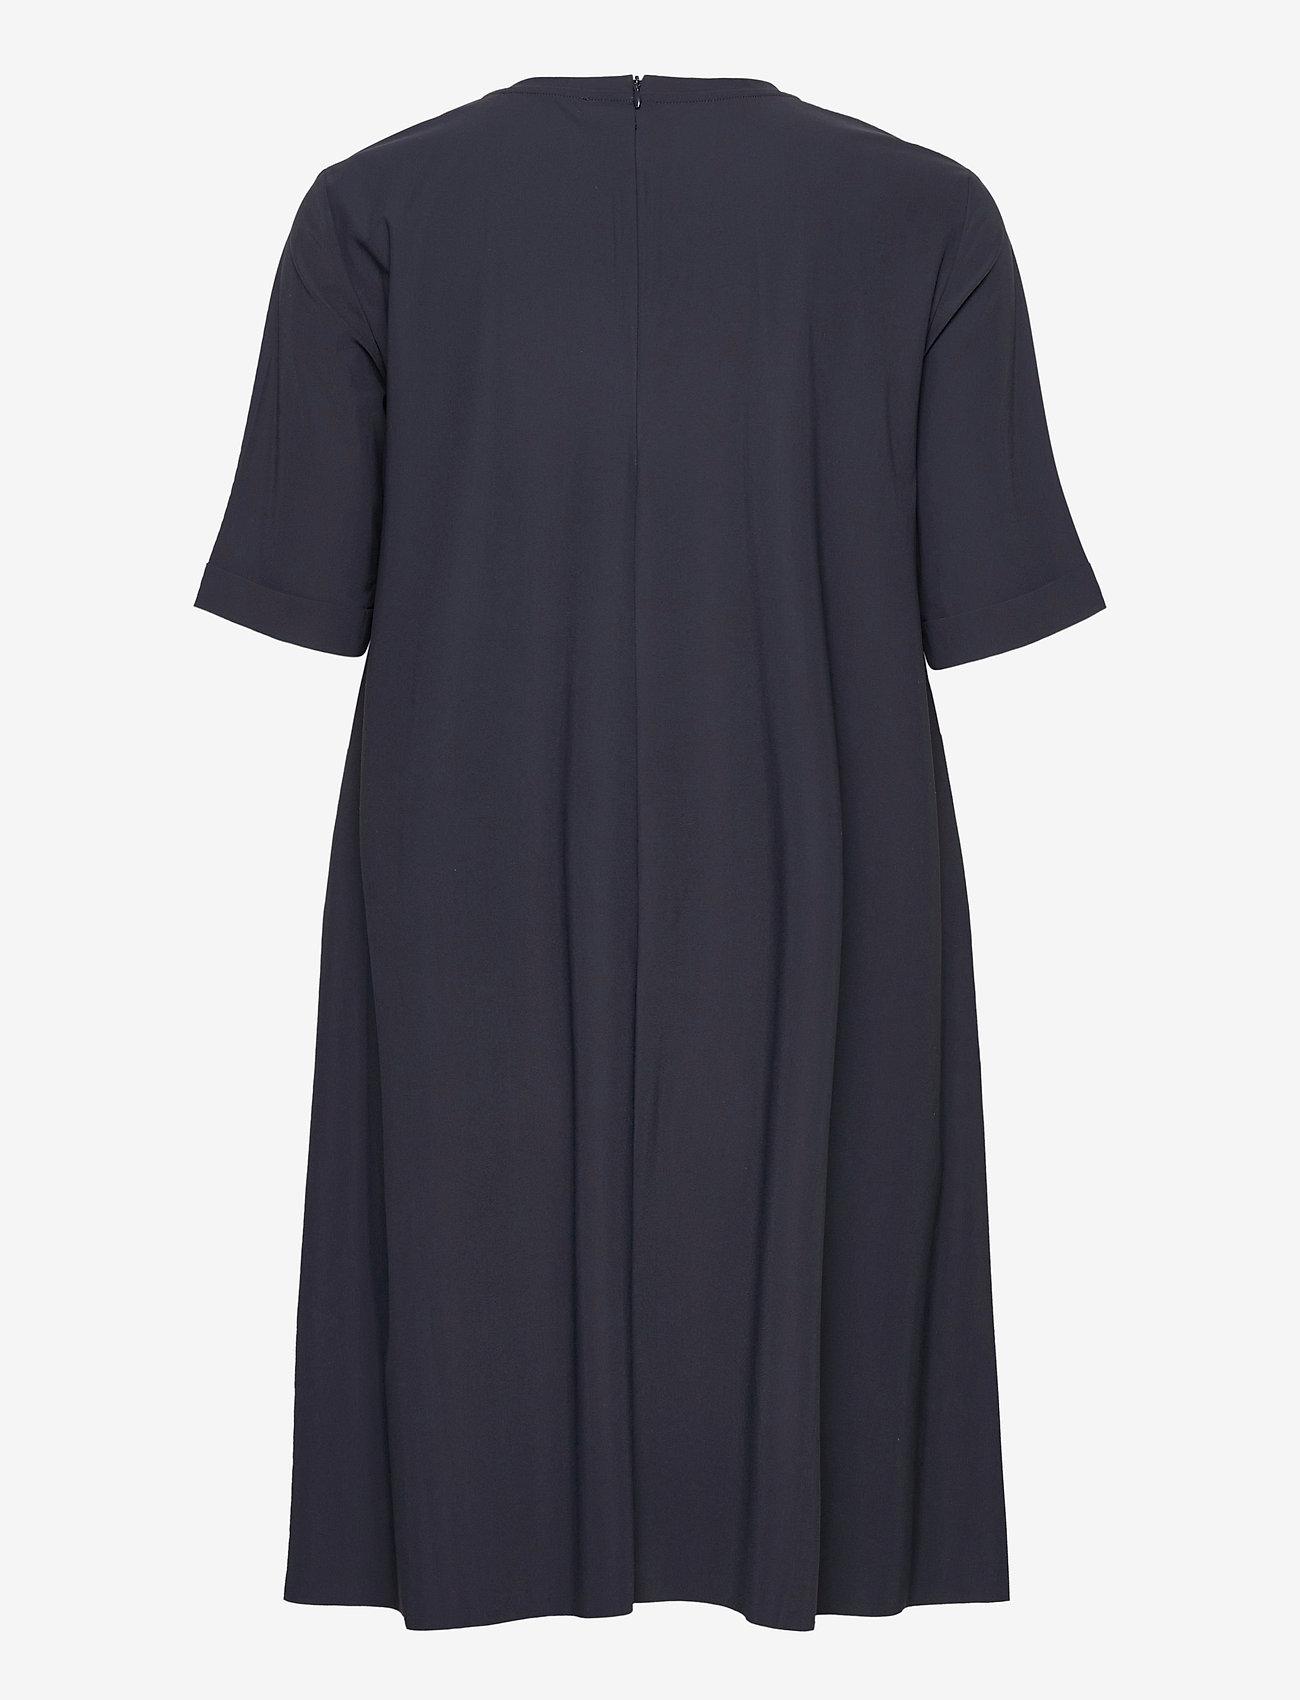 Max&Co. - CRONACA - alledaagse jurken - navy blue - 1